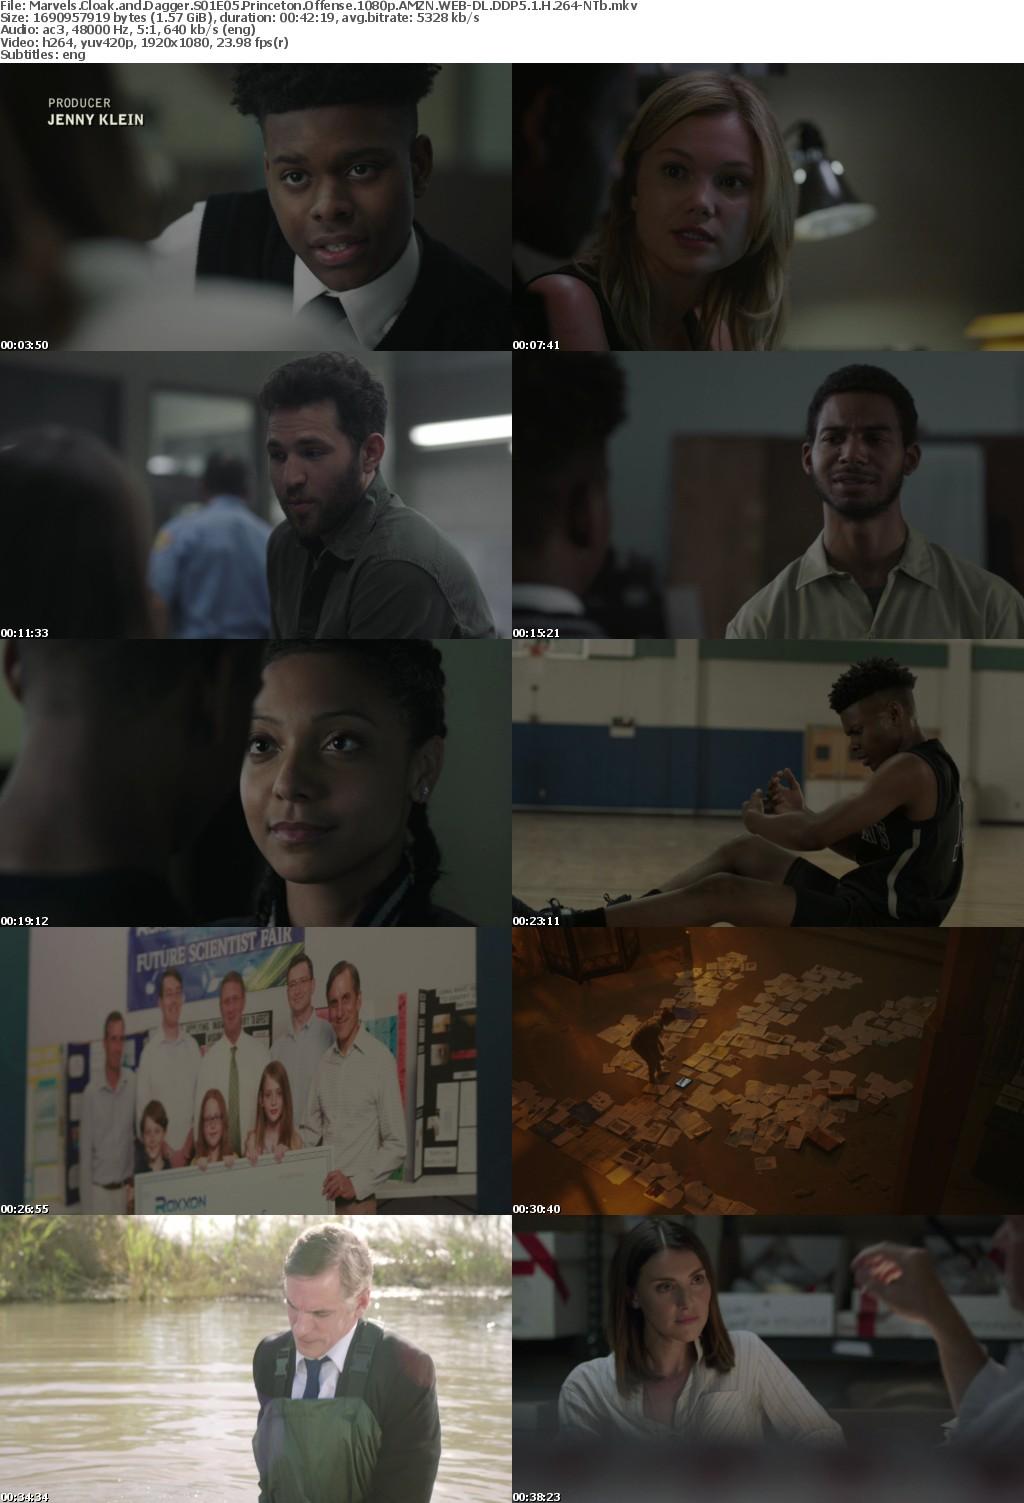 Marvels Cloak and Dagger S01E05 Princeton Offense 1080p AMZN WEB-DL DDP5 1 H 264-NTb